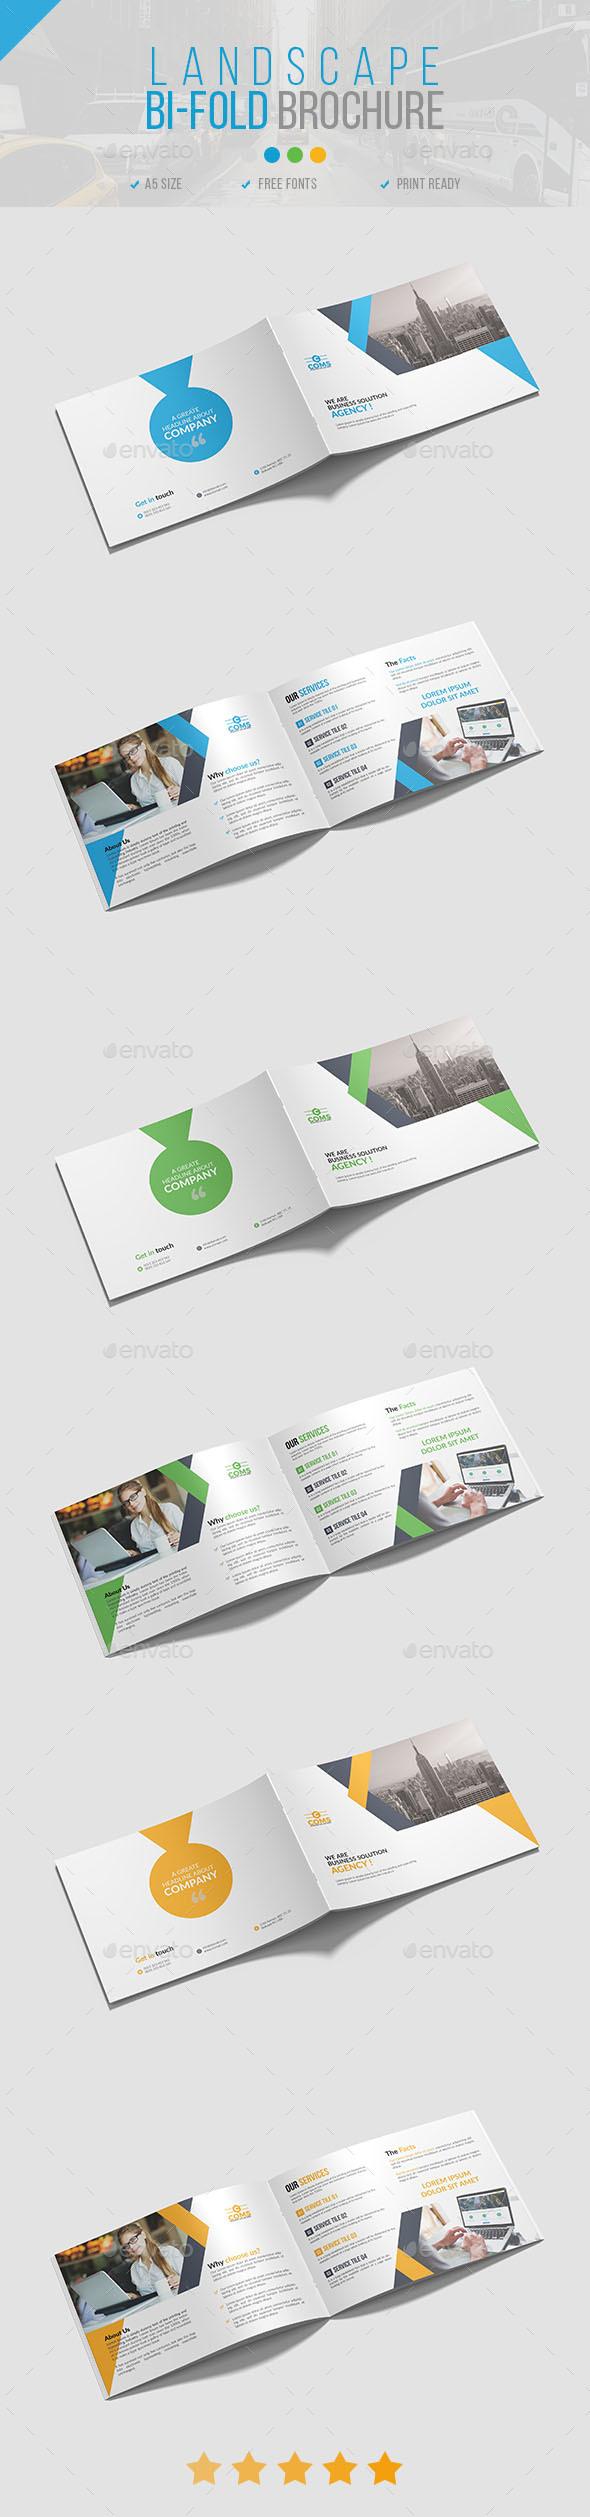 Landscape Bi-Fold Brochure 02 - Brochures Print Templates